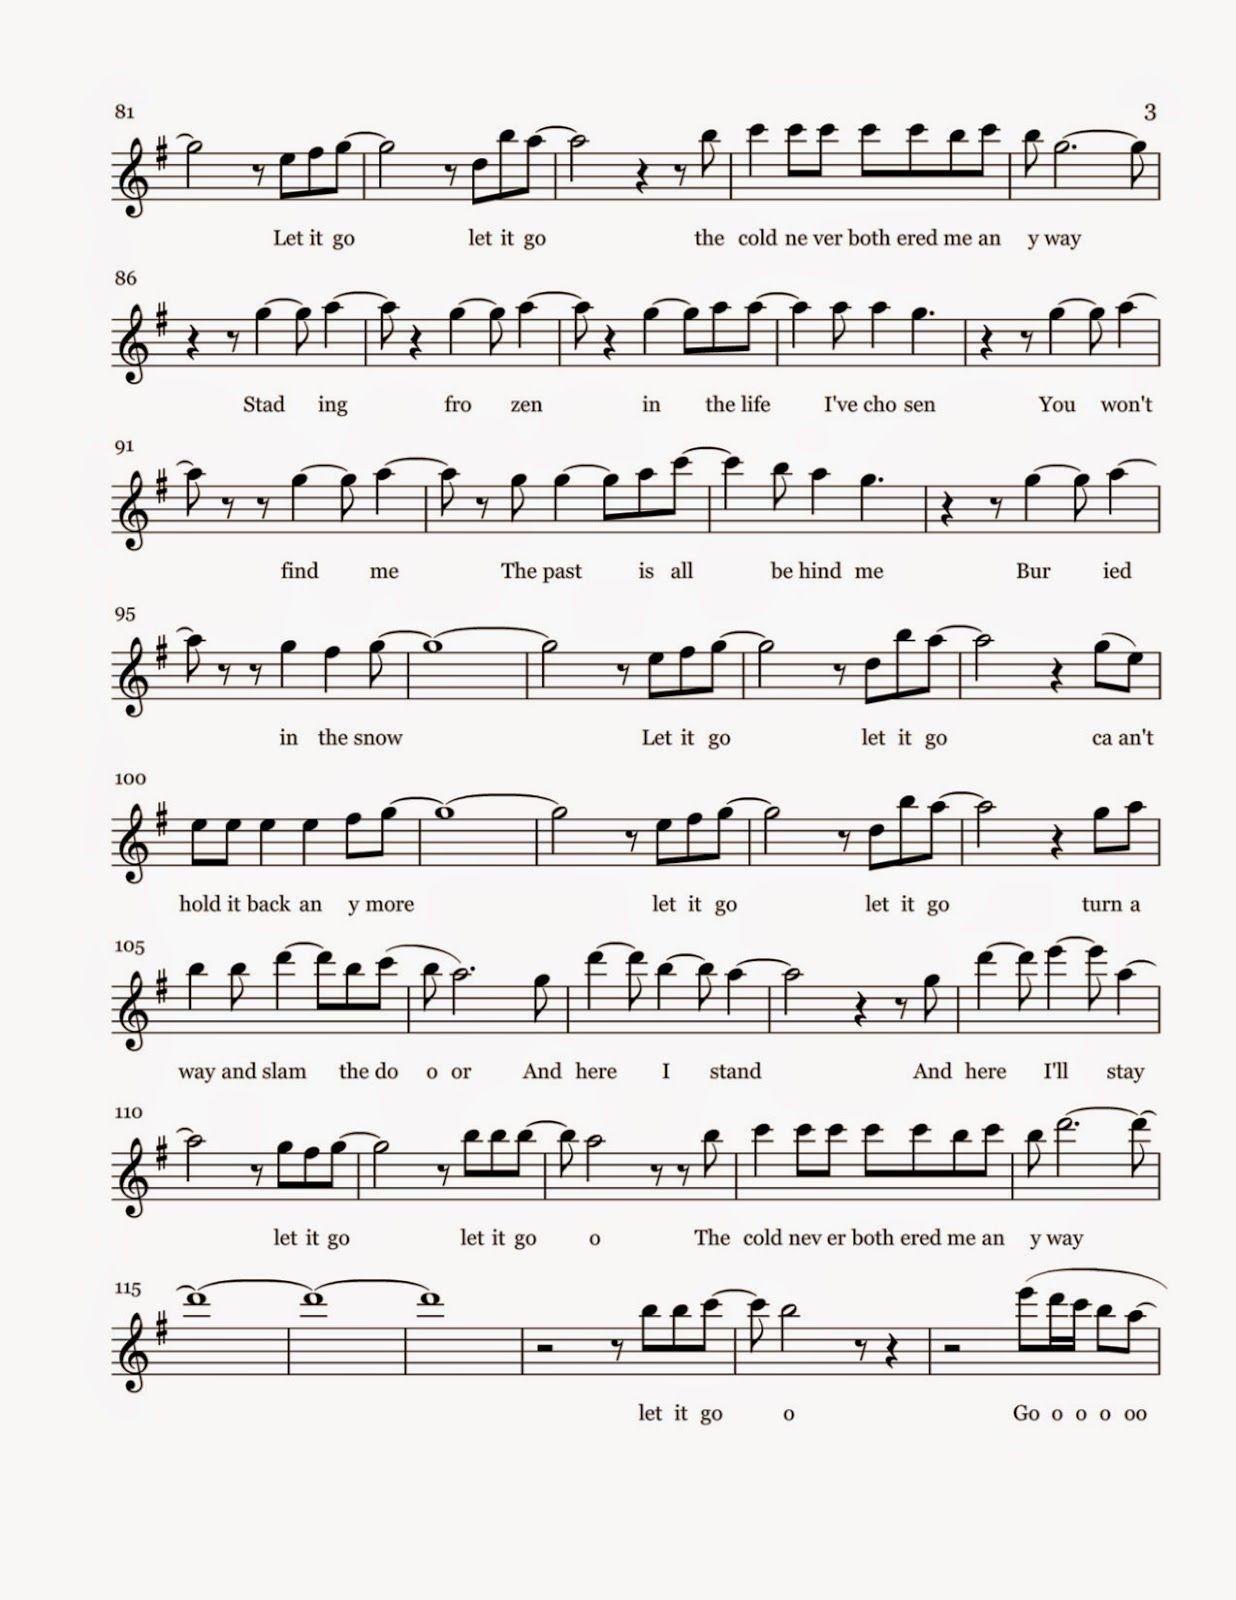 Flute Sheet Music Let It Go Sheet Music Sheet Music Flute